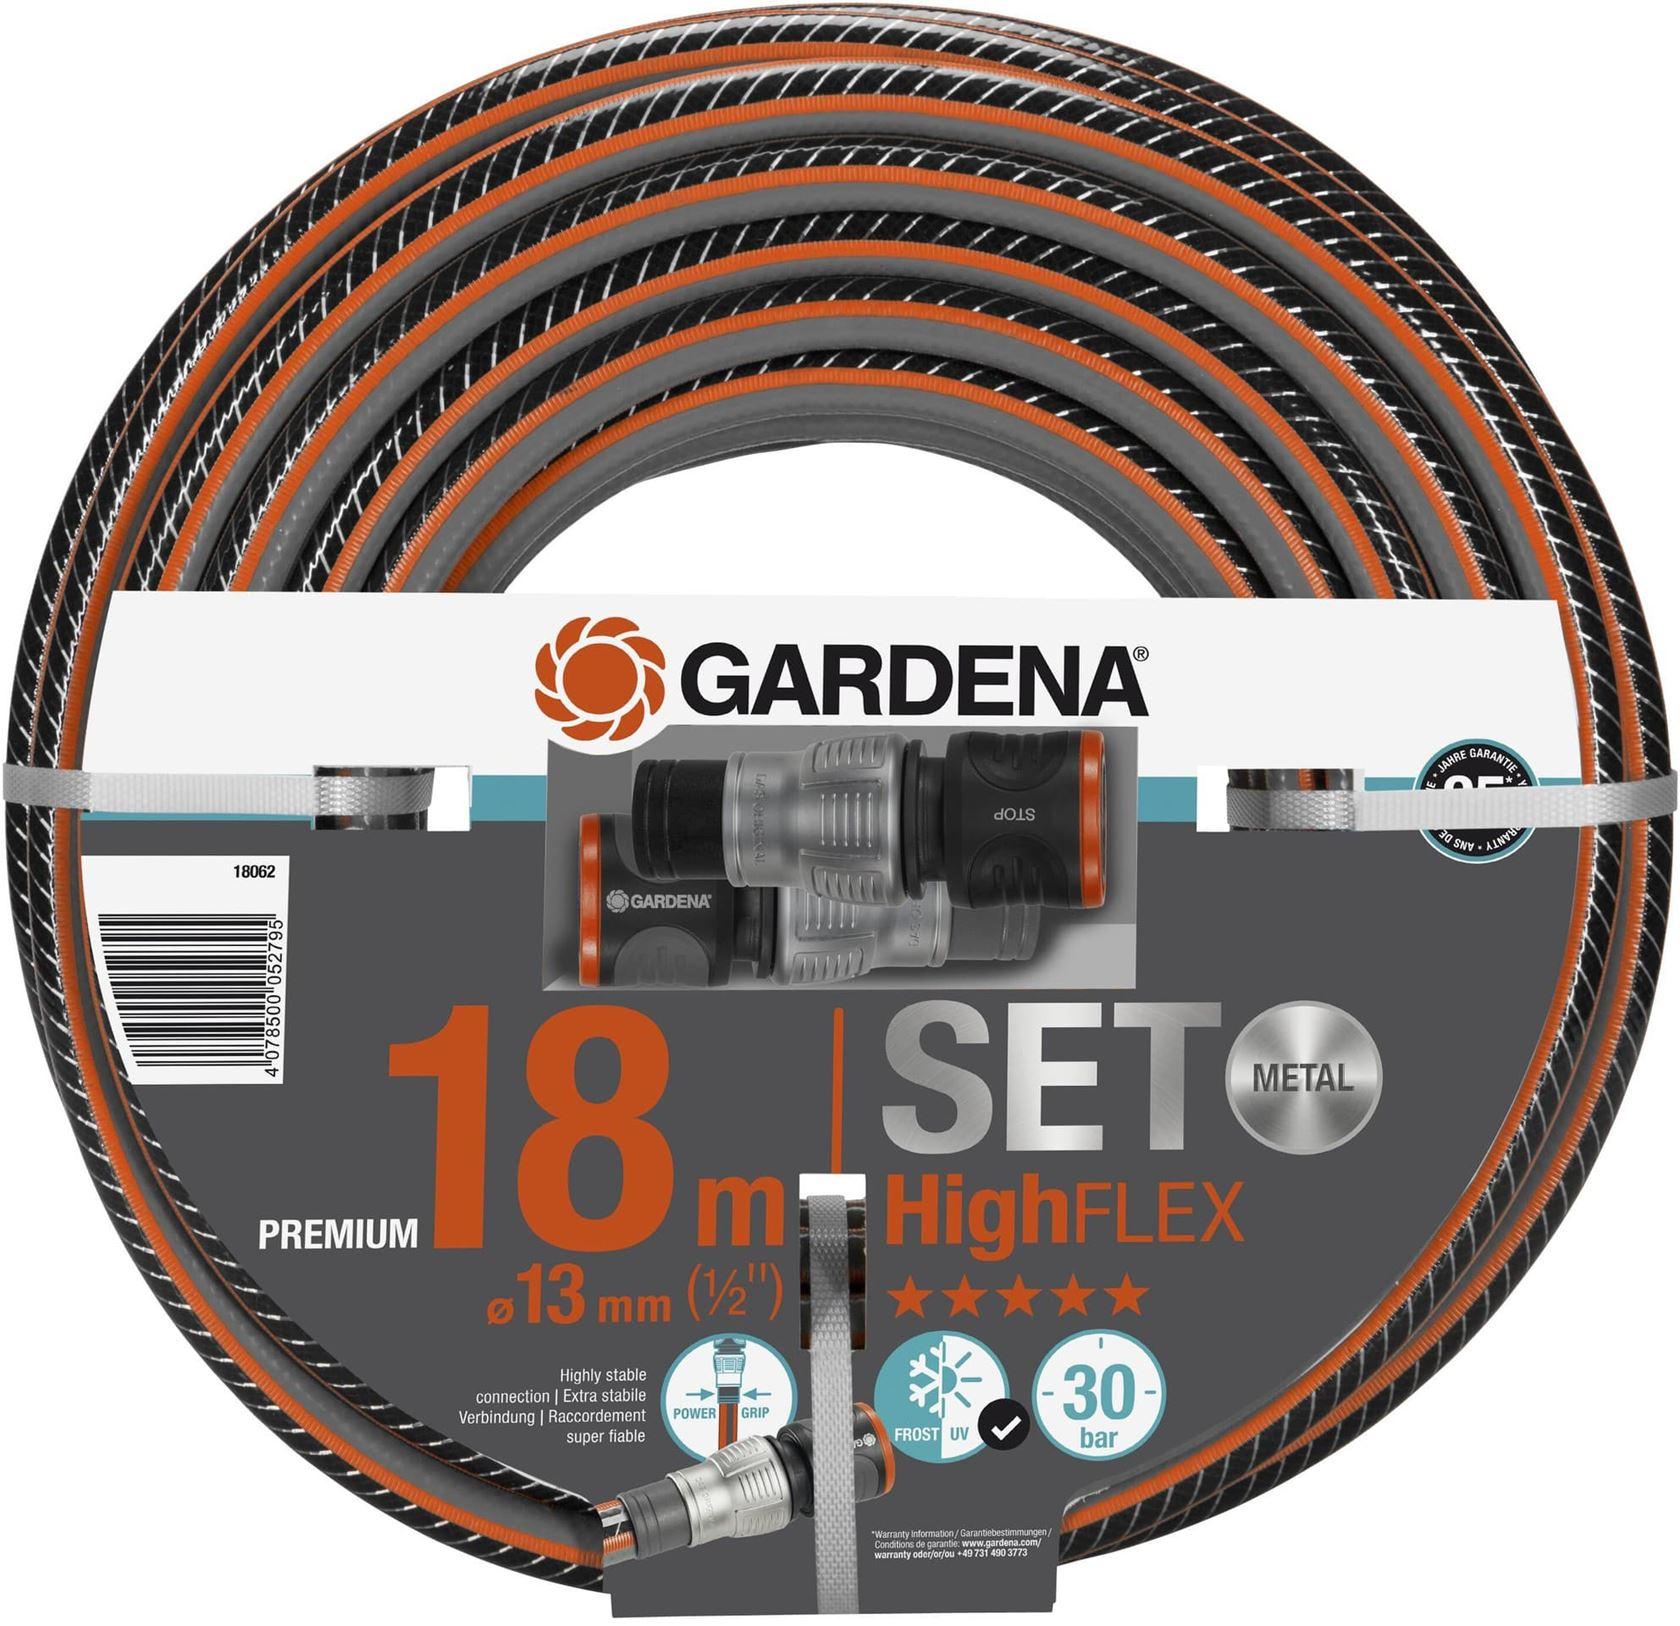 "Gardena Highflex slang 13 mm (1/2""), 18 m + premium ogs (incl. armatuur)"